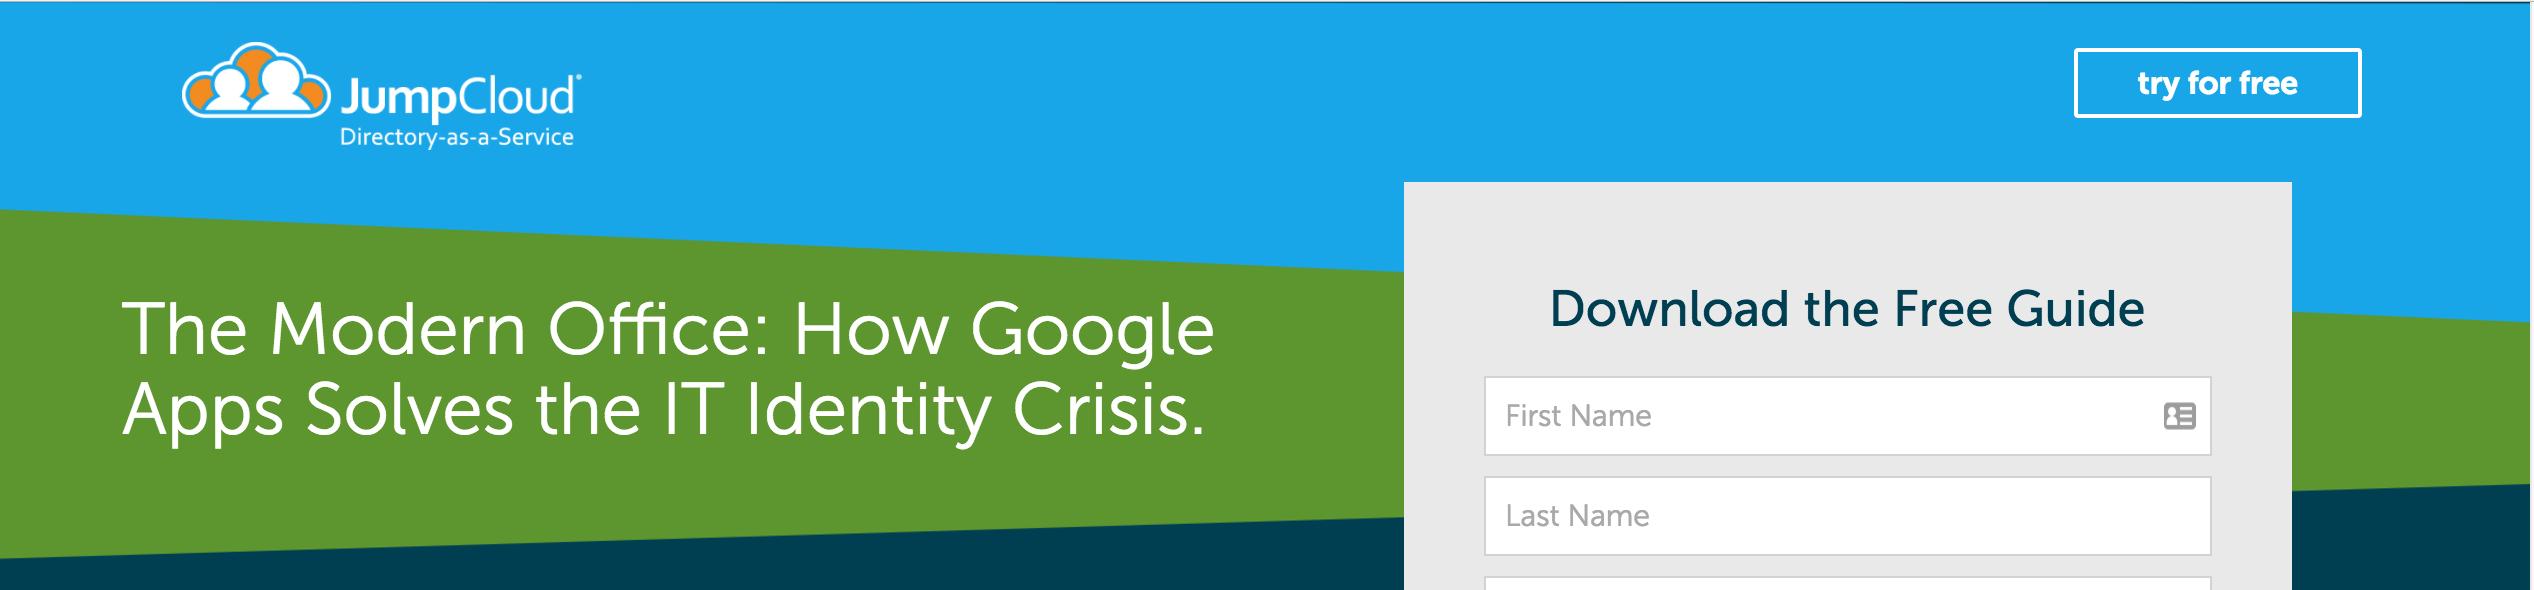 Landing page header